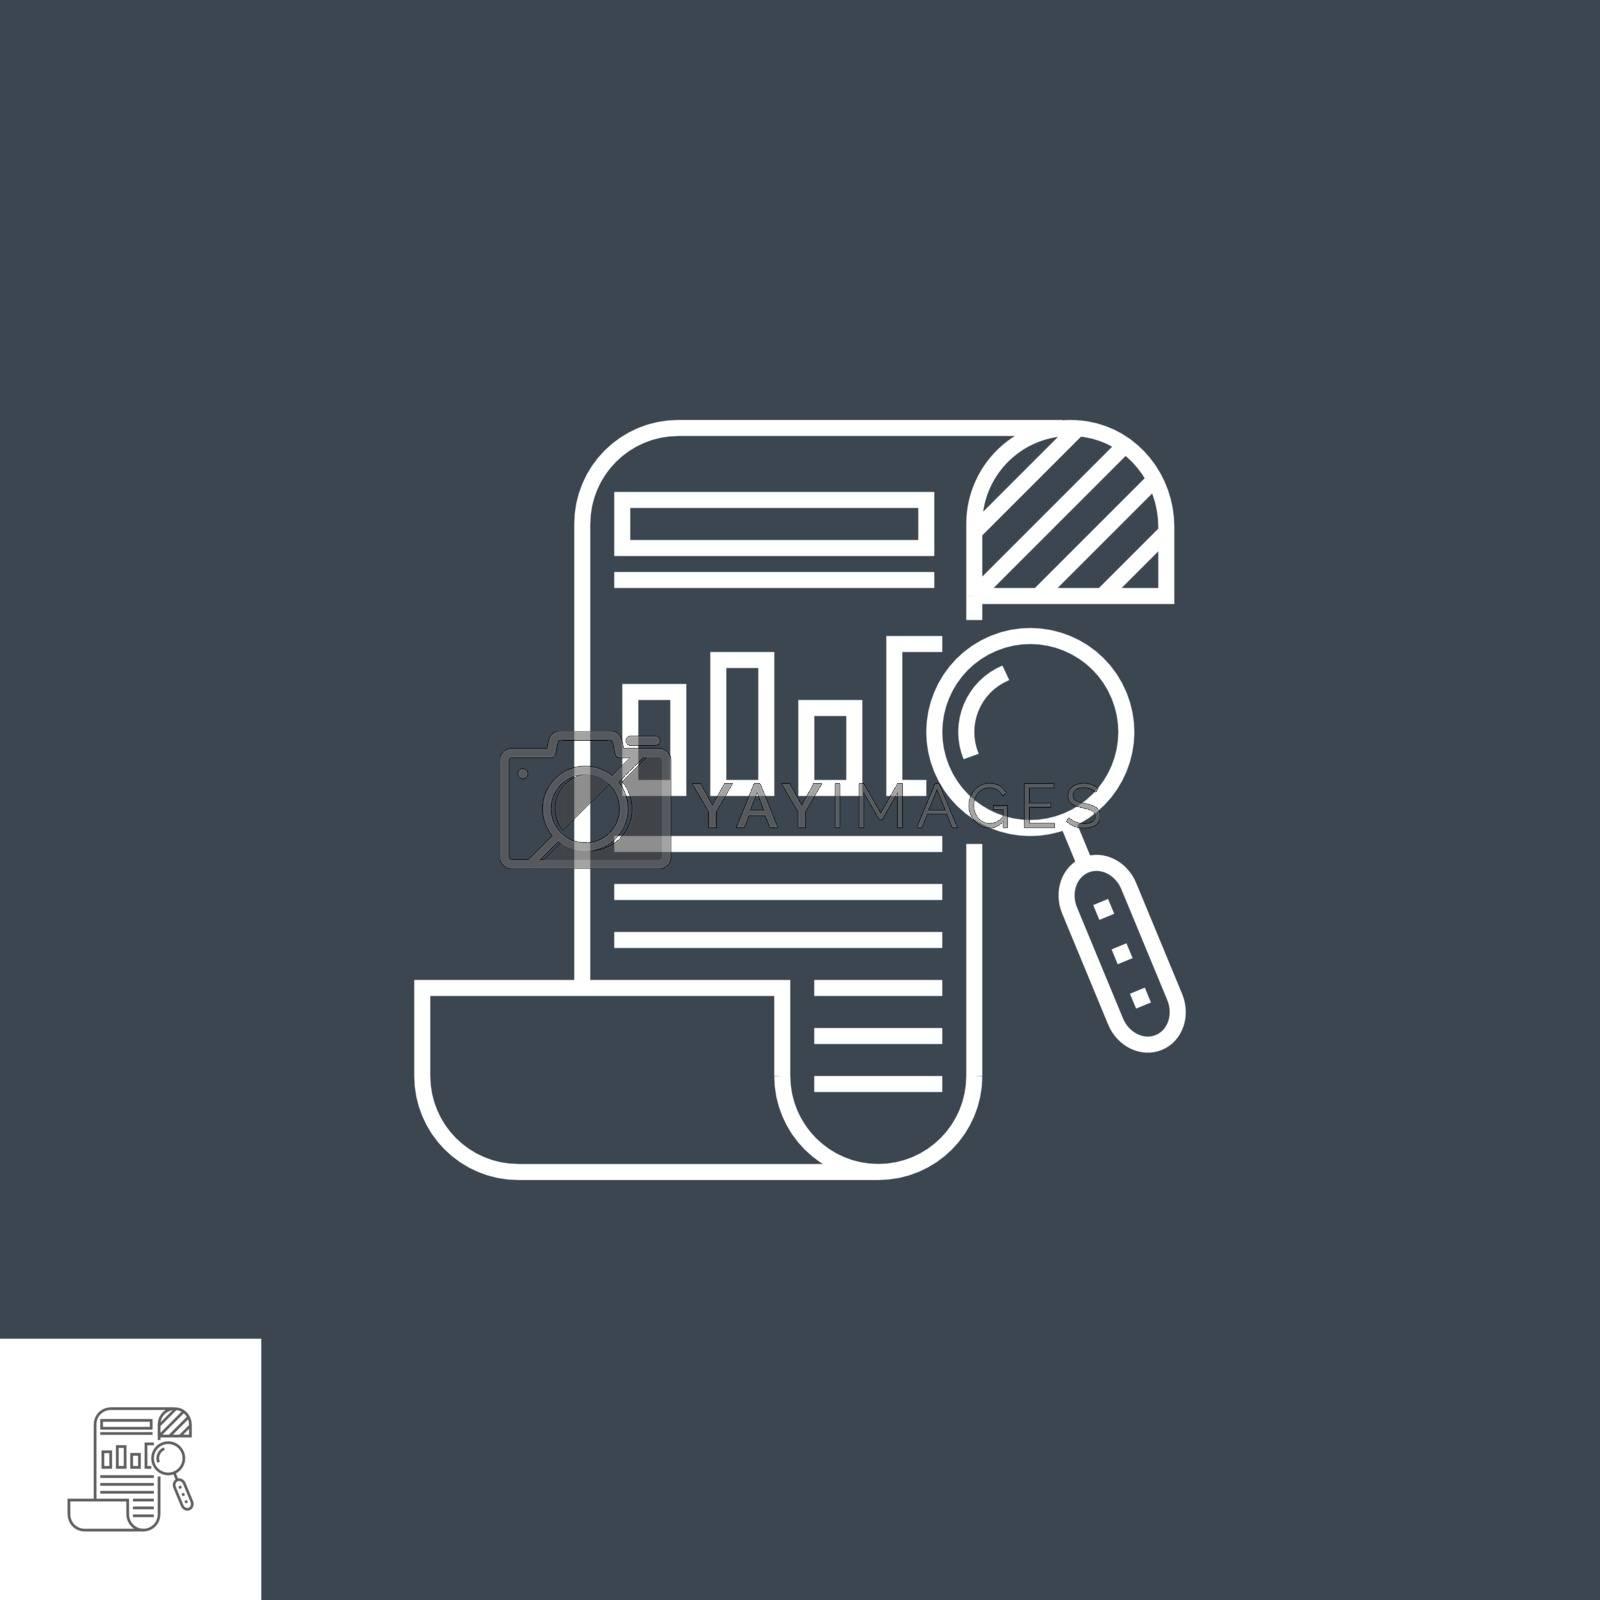 SEO Report Line Icon by smoki